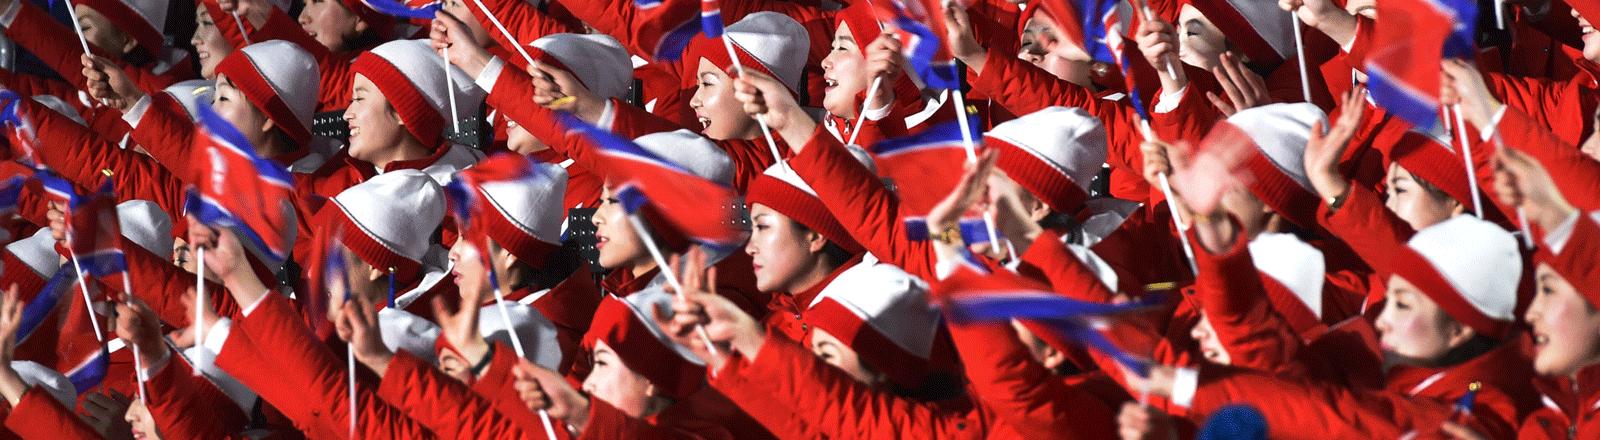 Nordkoreaner bei Olympia